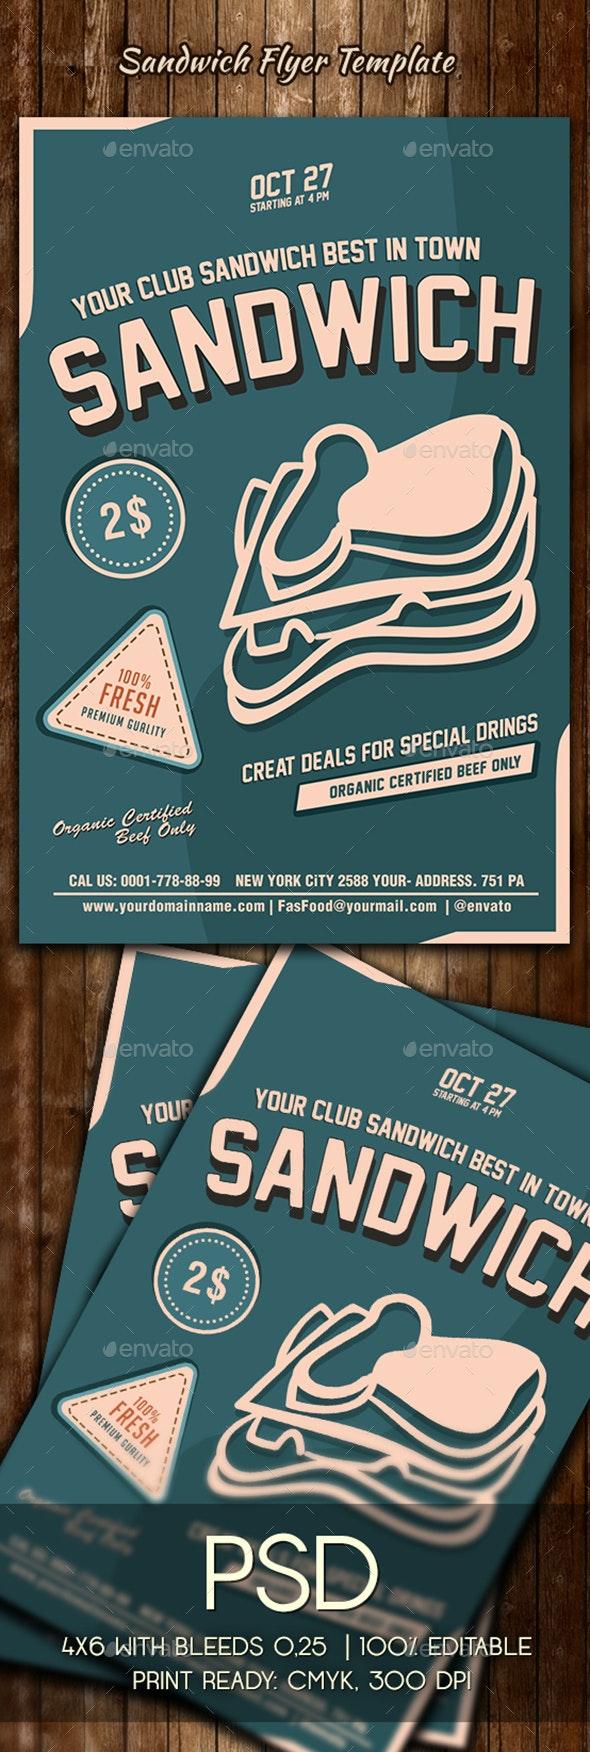 Sandwich Flyer Template - Restaurant Flyers